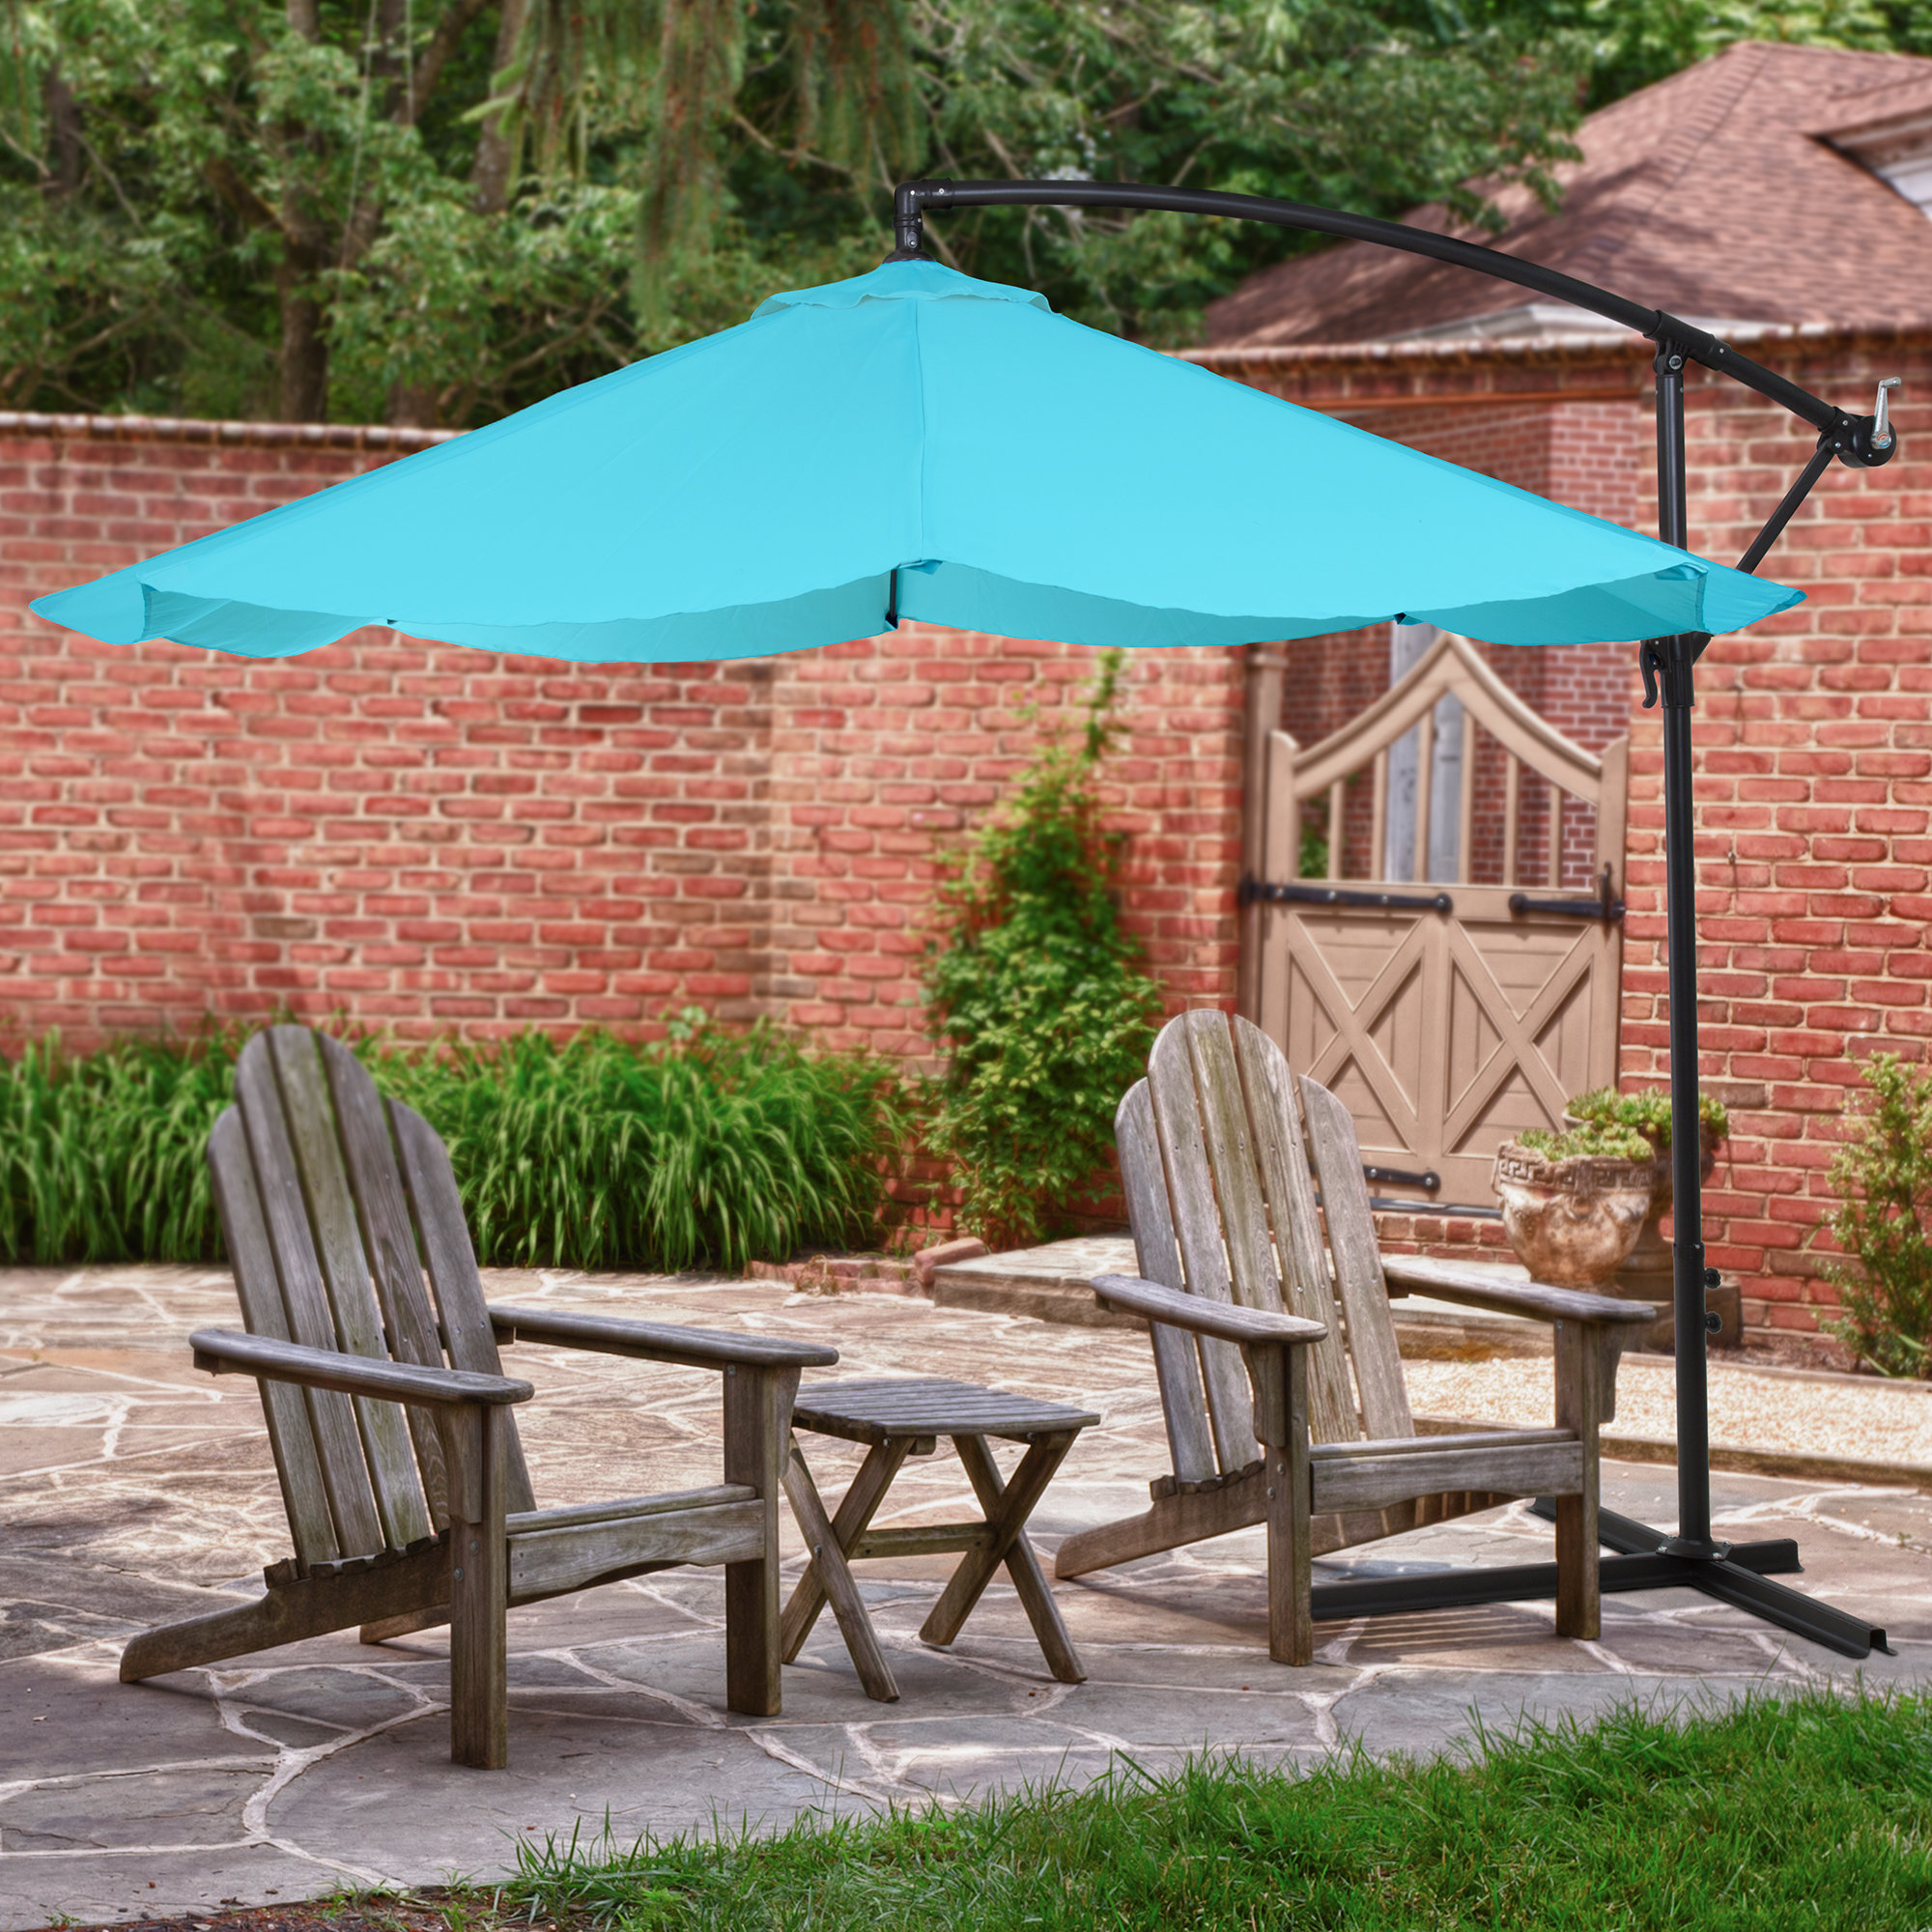 Vassalboro 10' Cantilever Umbrella For Fashionable Jaelynn Cantilever Umbrellas (Gallery 16 of 20)